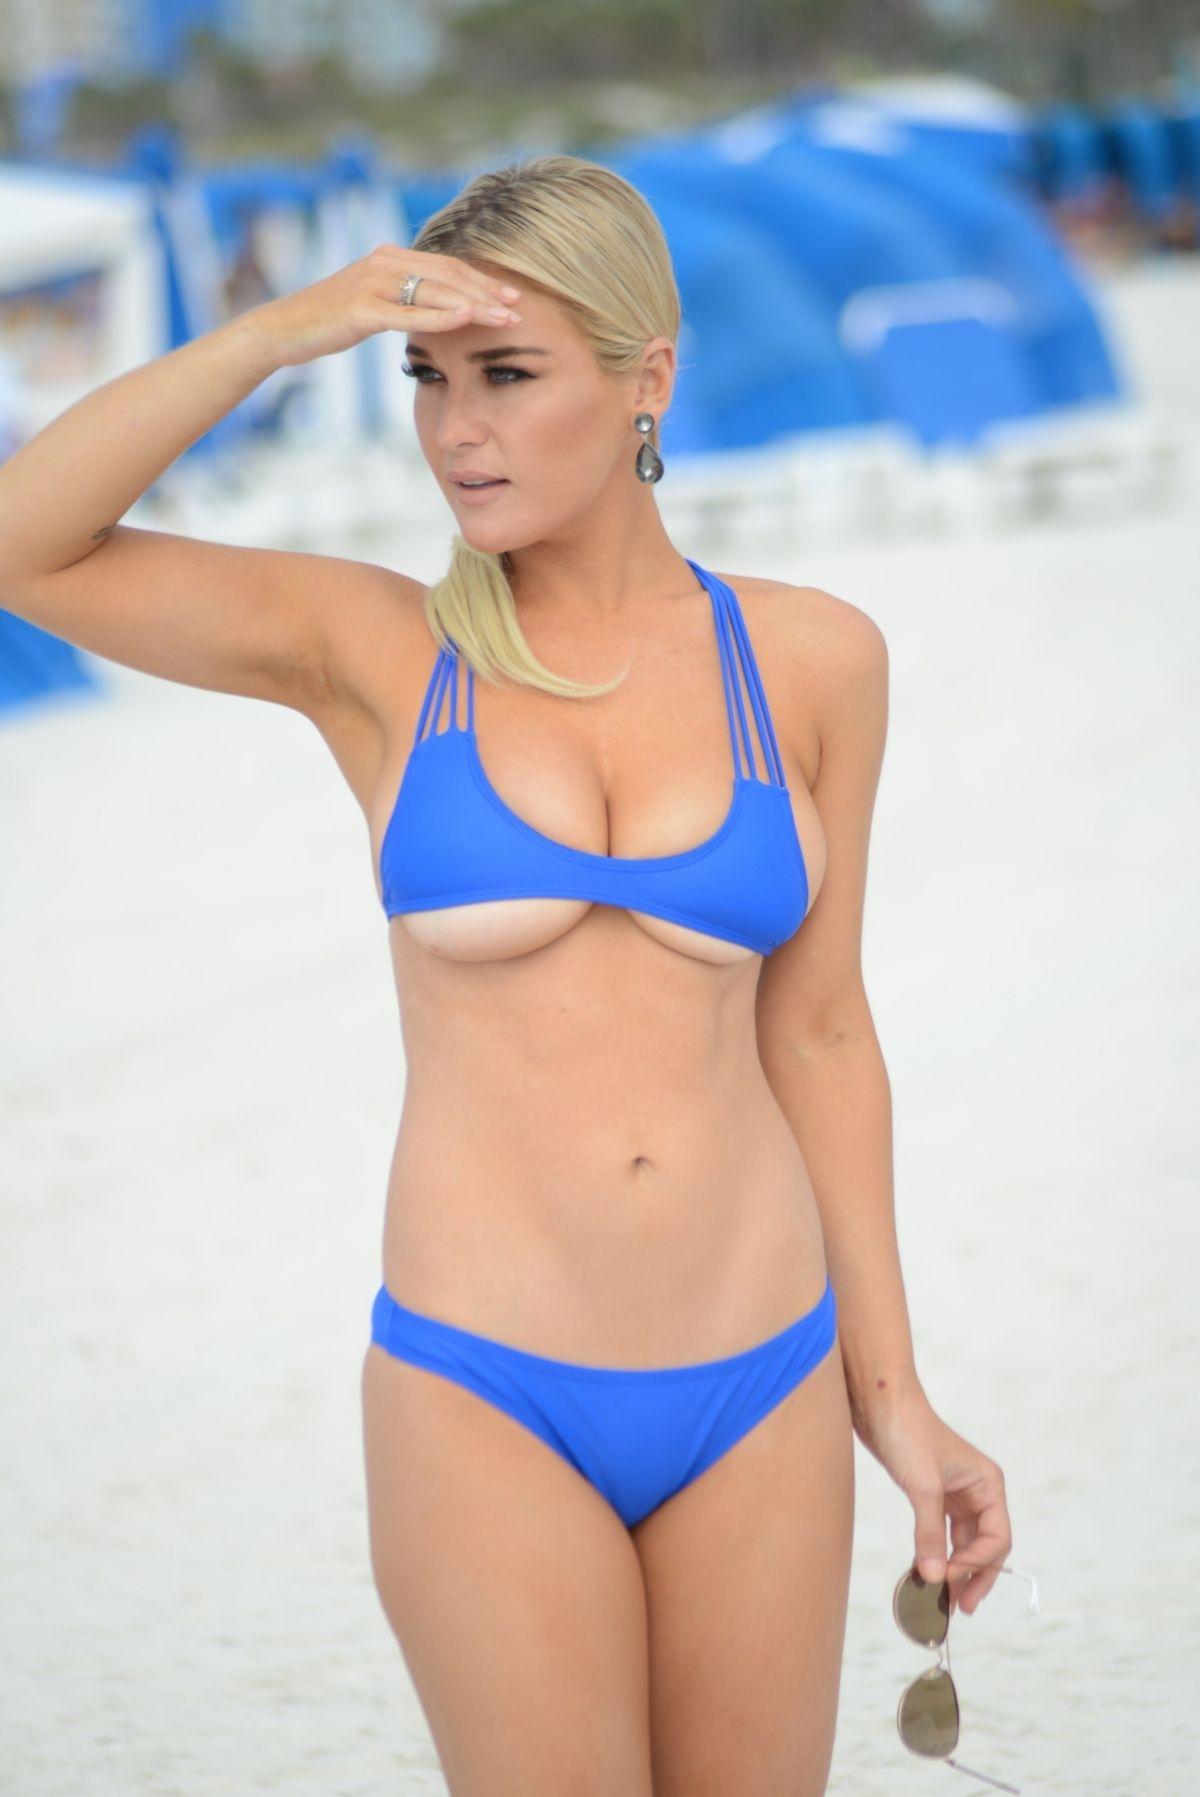 Bikini Lauren Hubbard nude (69 photo), Sexy, Paparazzi, Instagram, butt 2020